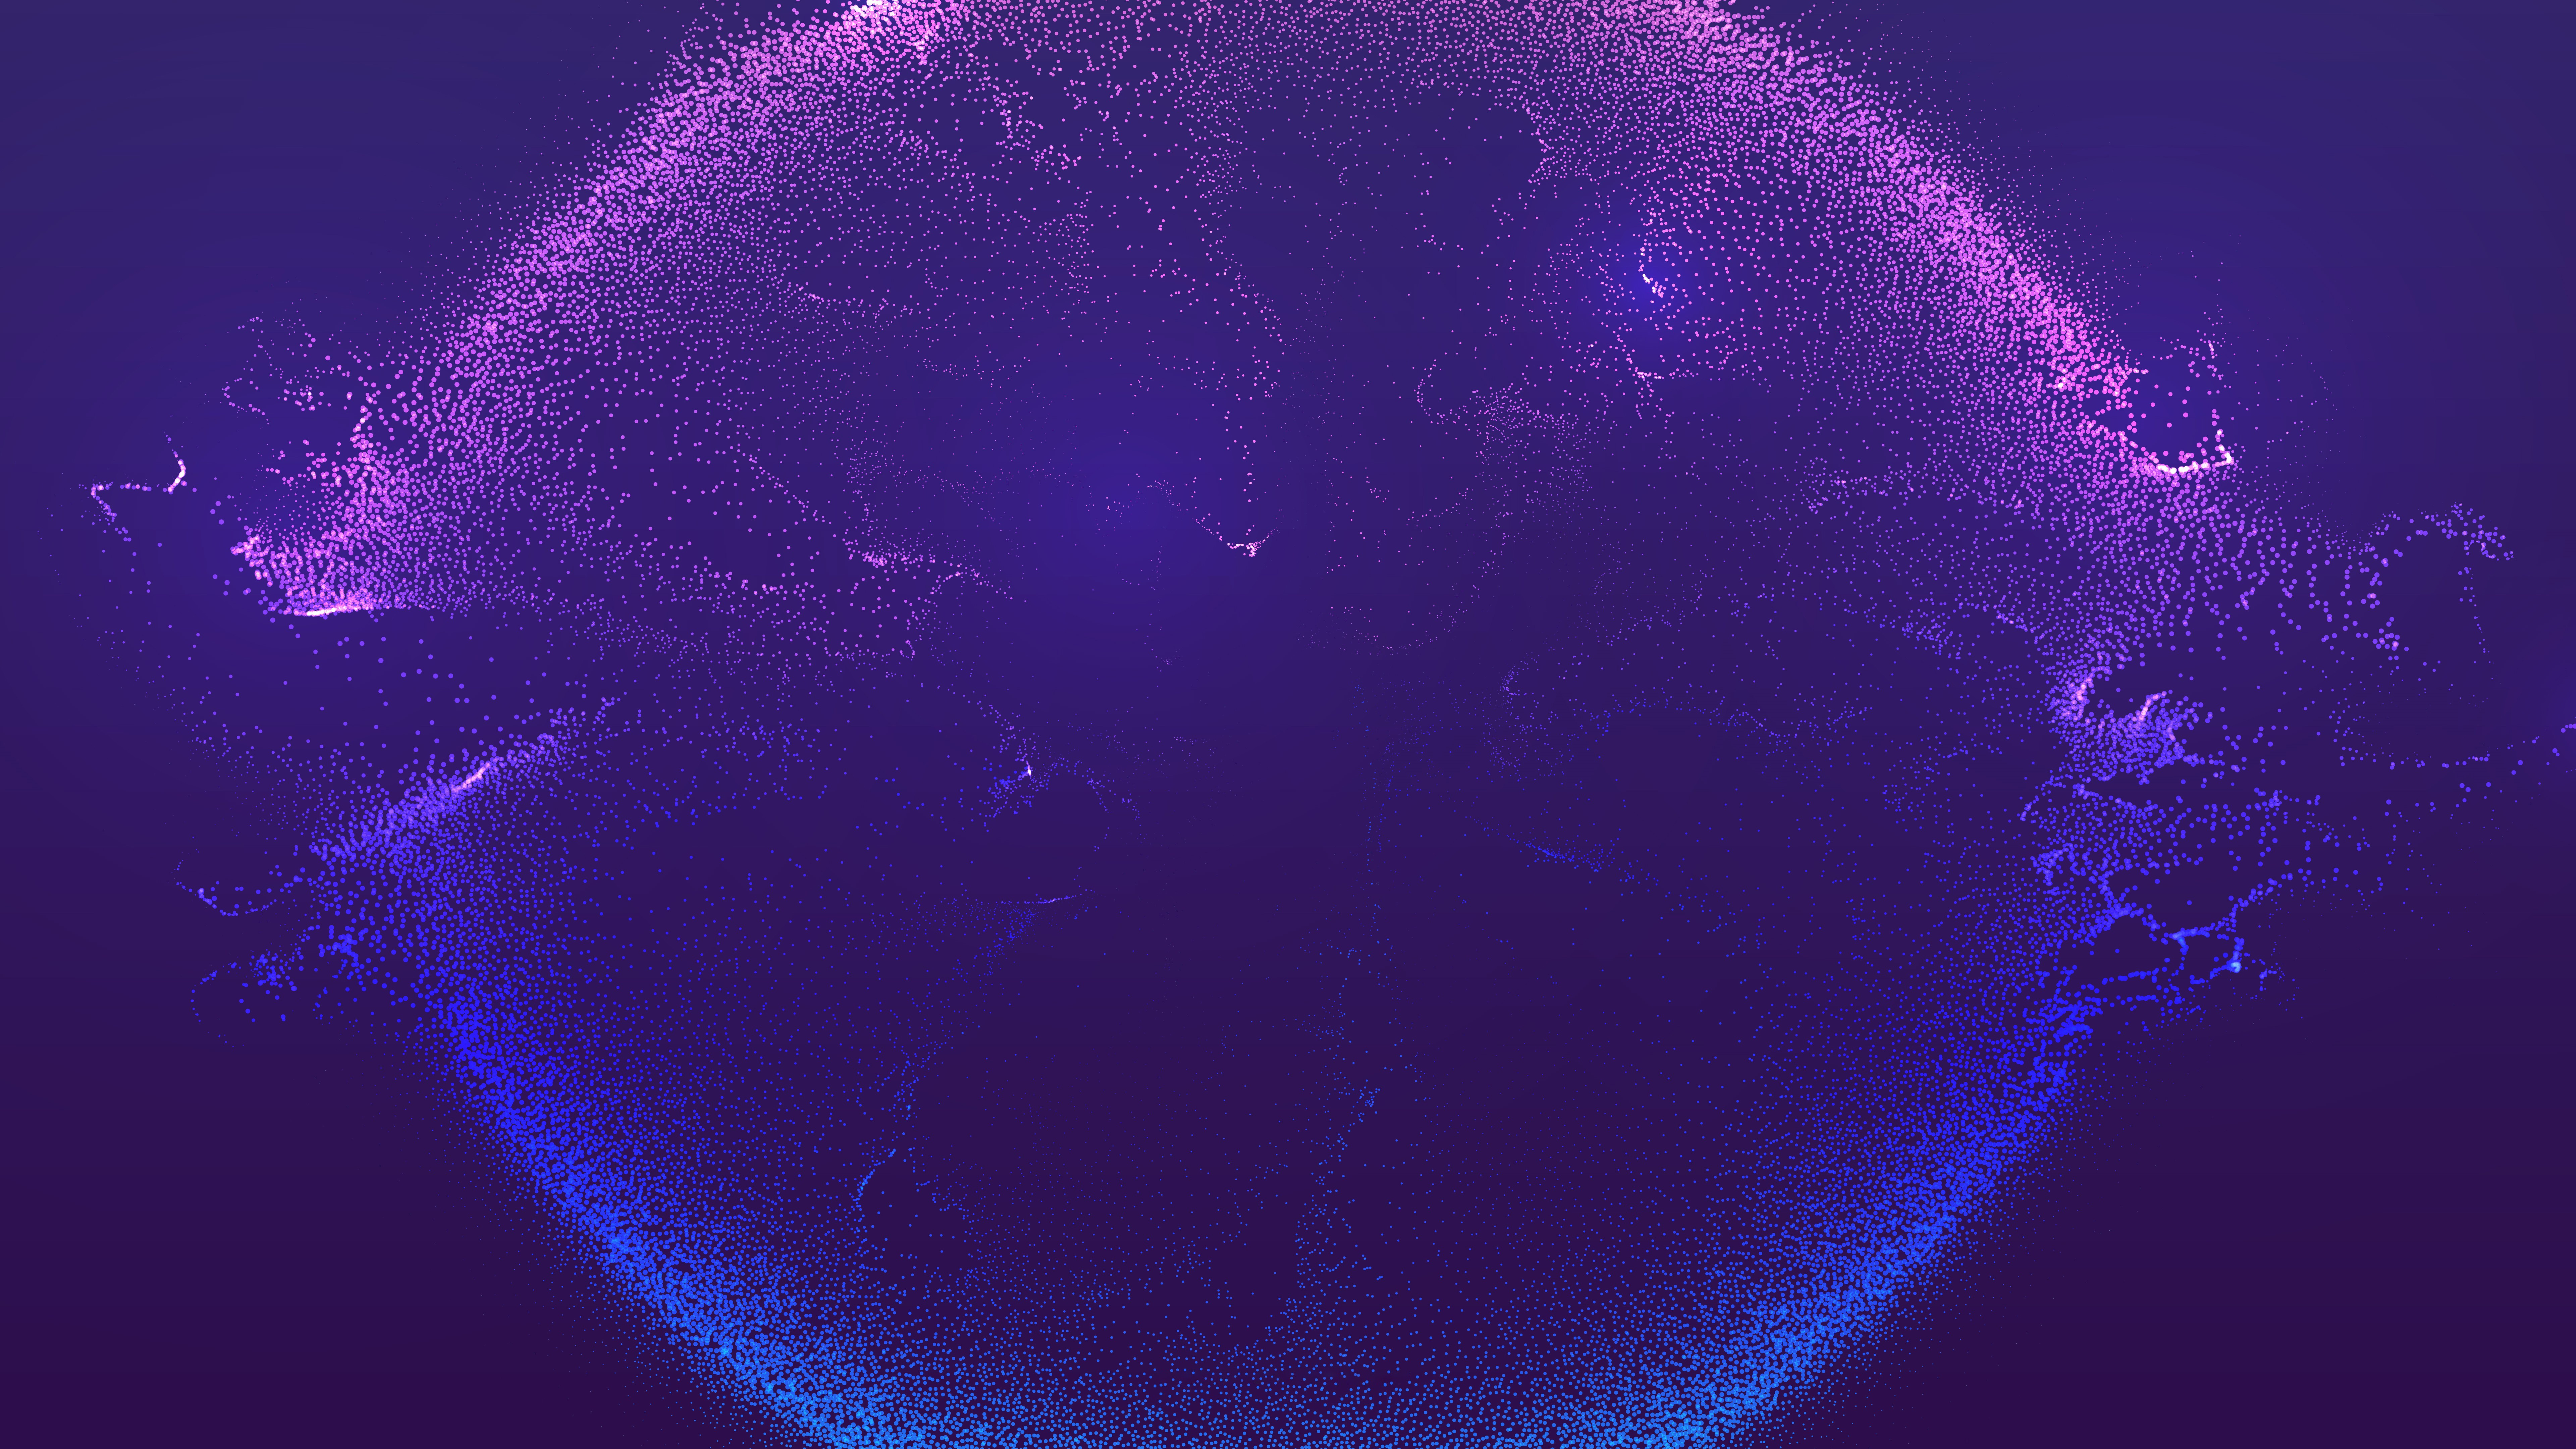 Blue explosion wallpaper